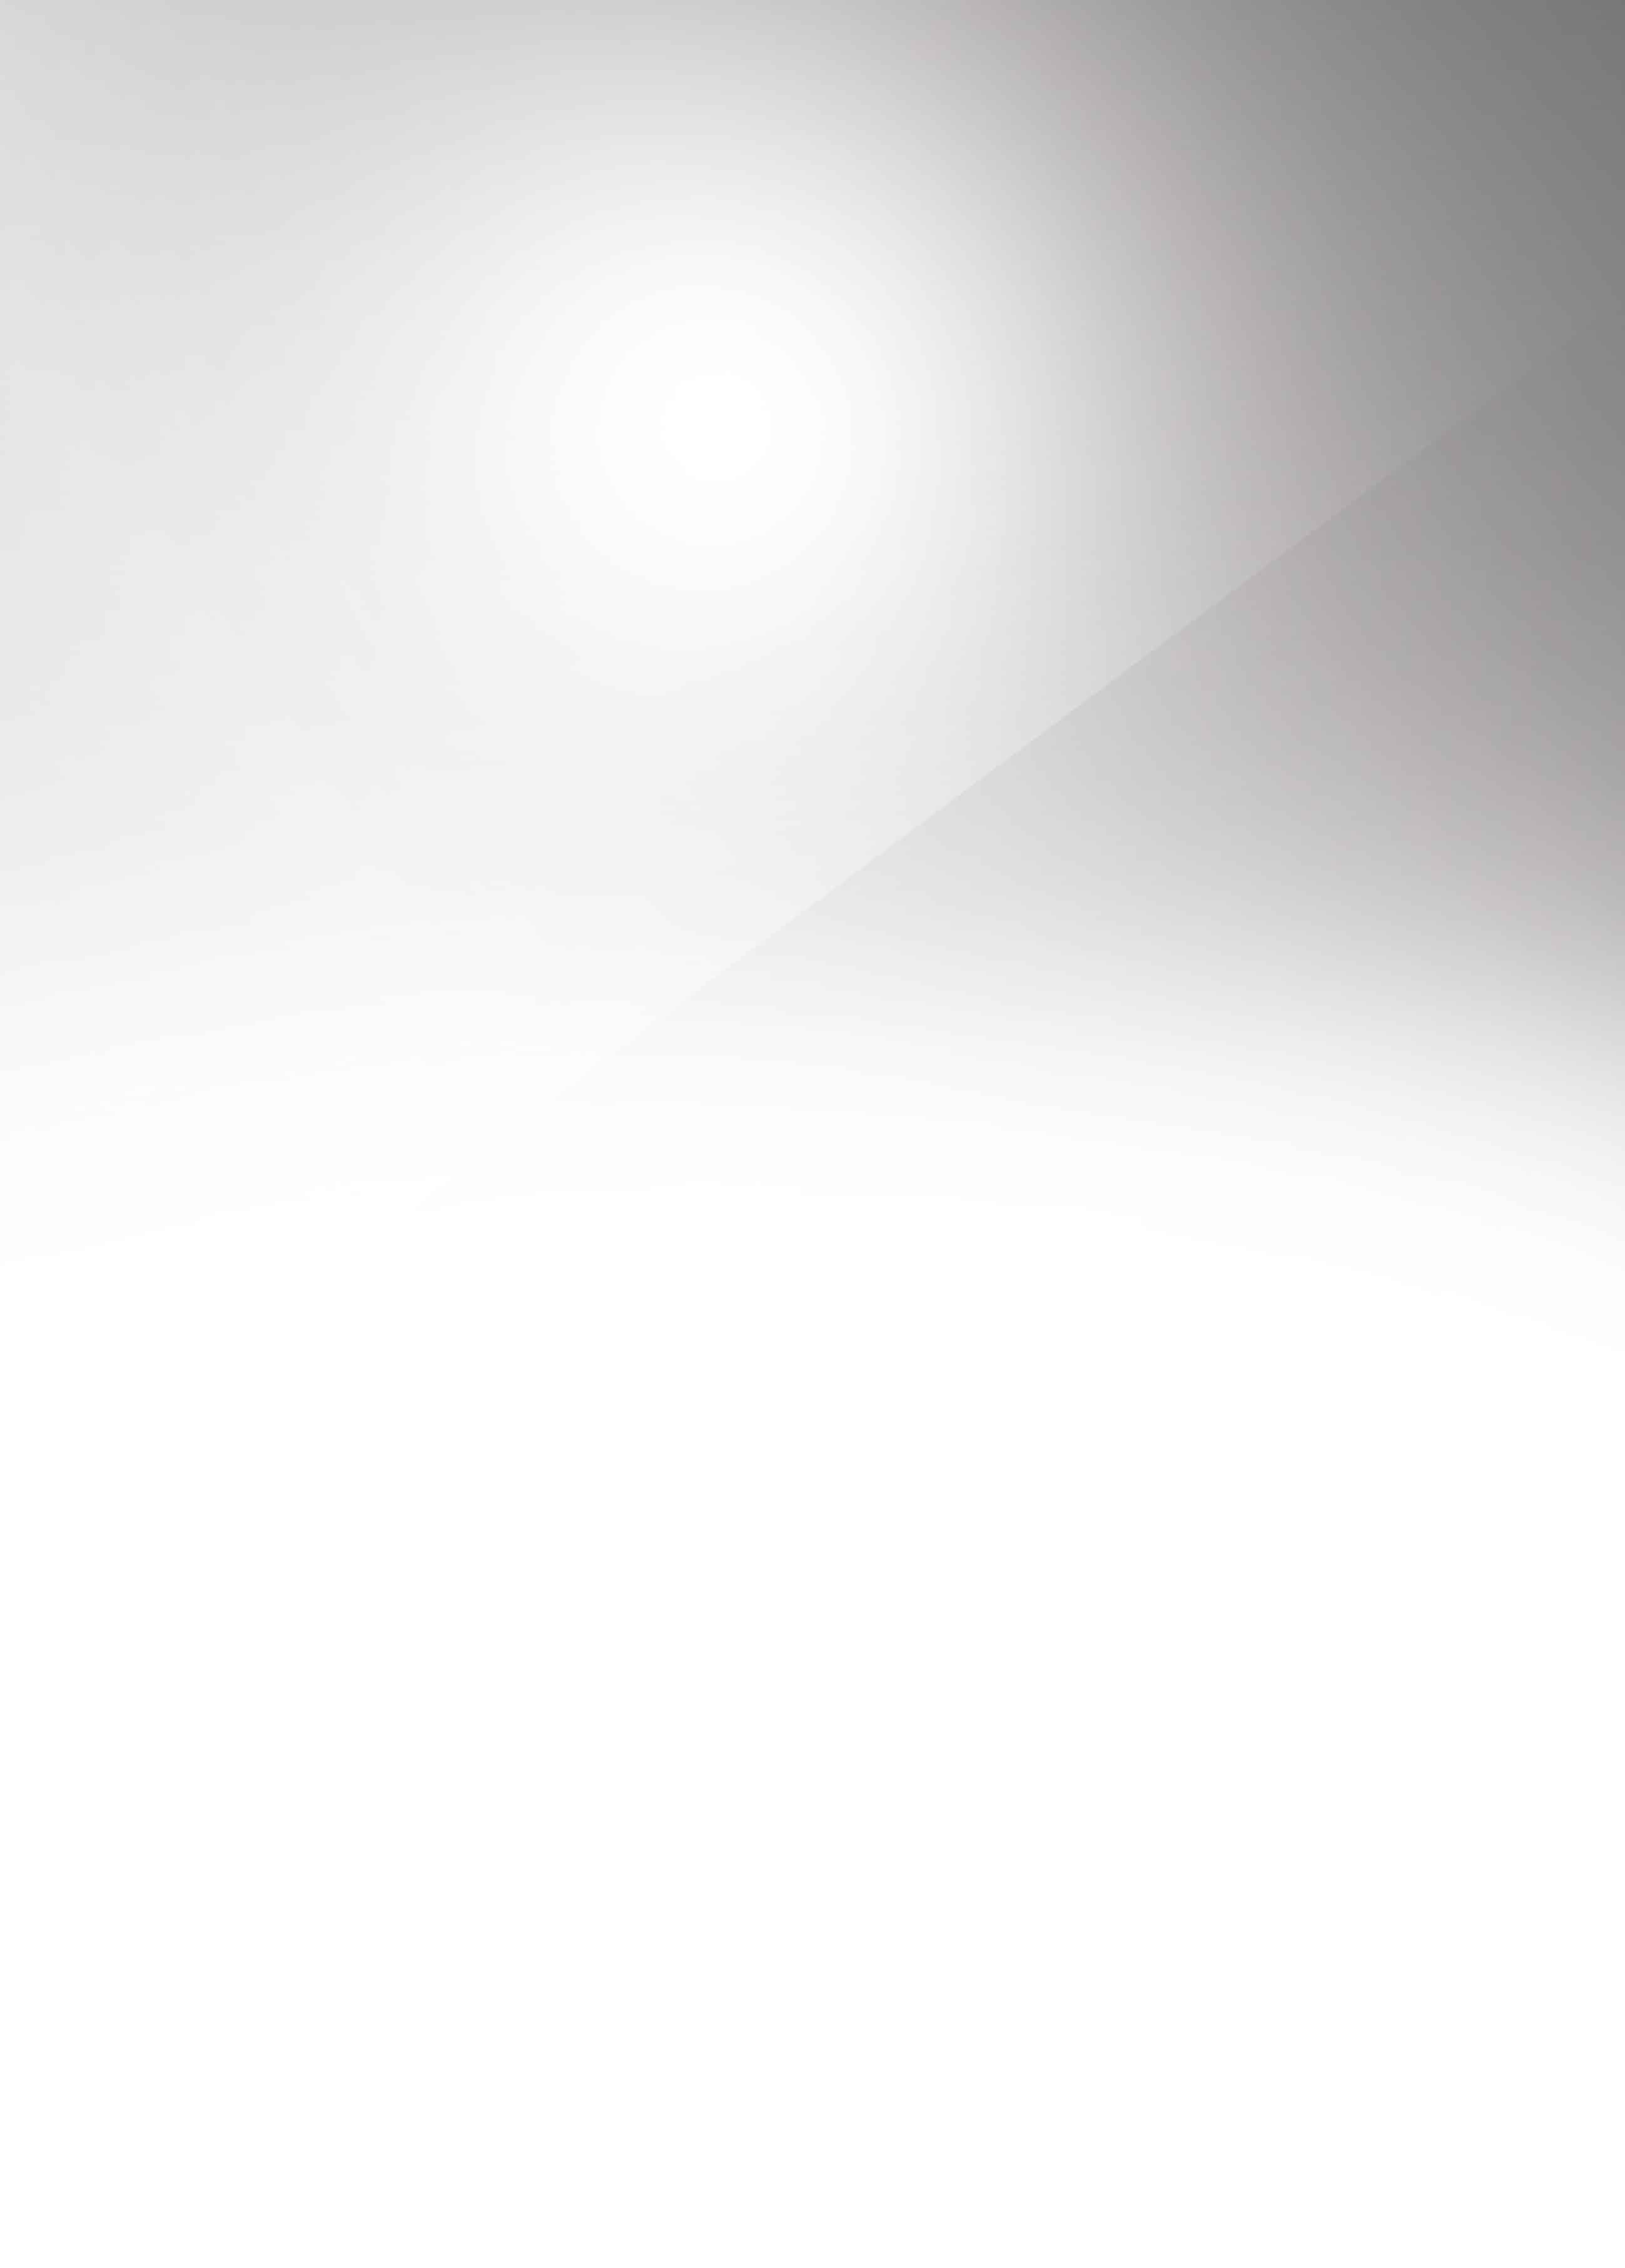 Edelstahl Silverline Vega Intern Premium VGID 124 E Deckenhaube 120 cm